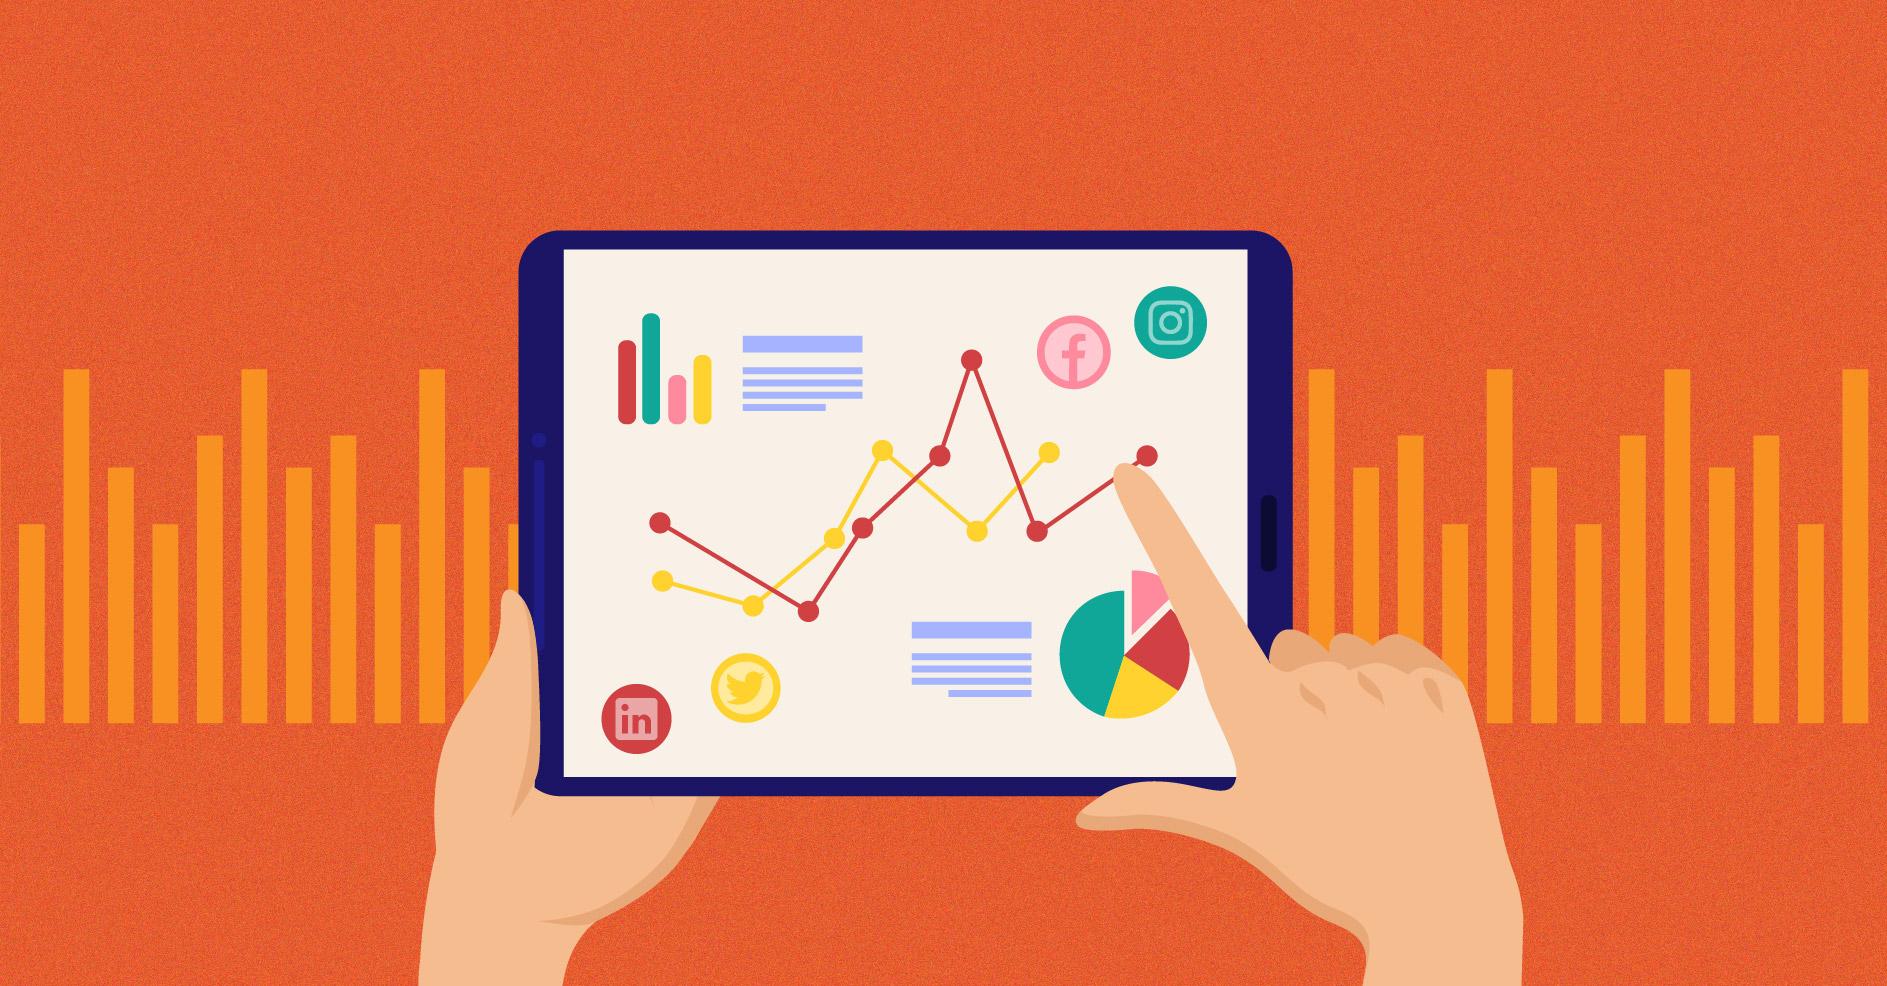 https://spotme.com/wp-content/uploads/2021/03/Hero-Virtual-Event-Marketing-Ideas-6-Strategies-to-Succeed-in-2021.jpg